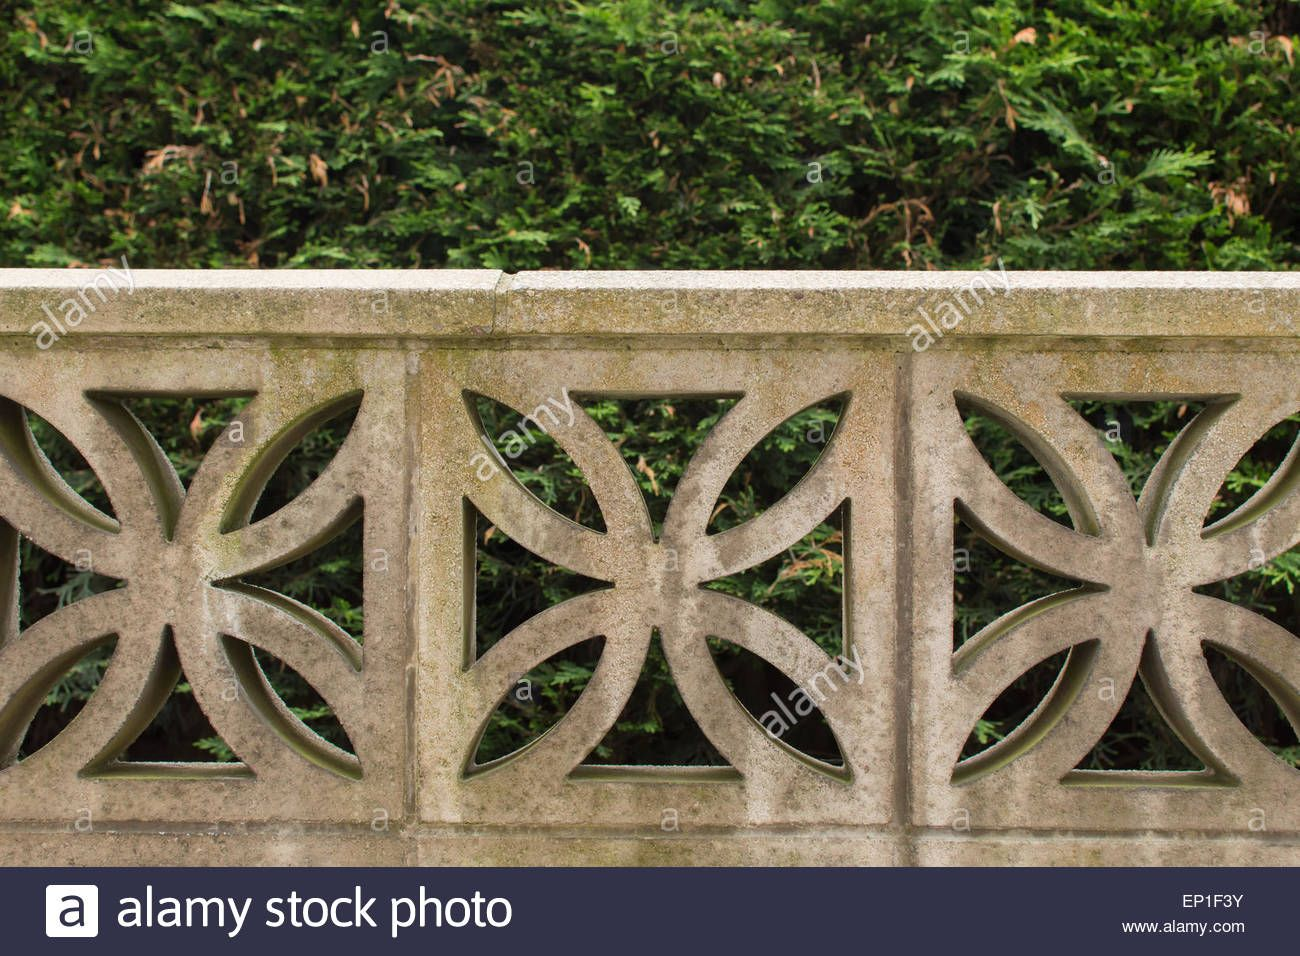 Garden Wall Built From Decorative Concrete Blocks Stock Photo